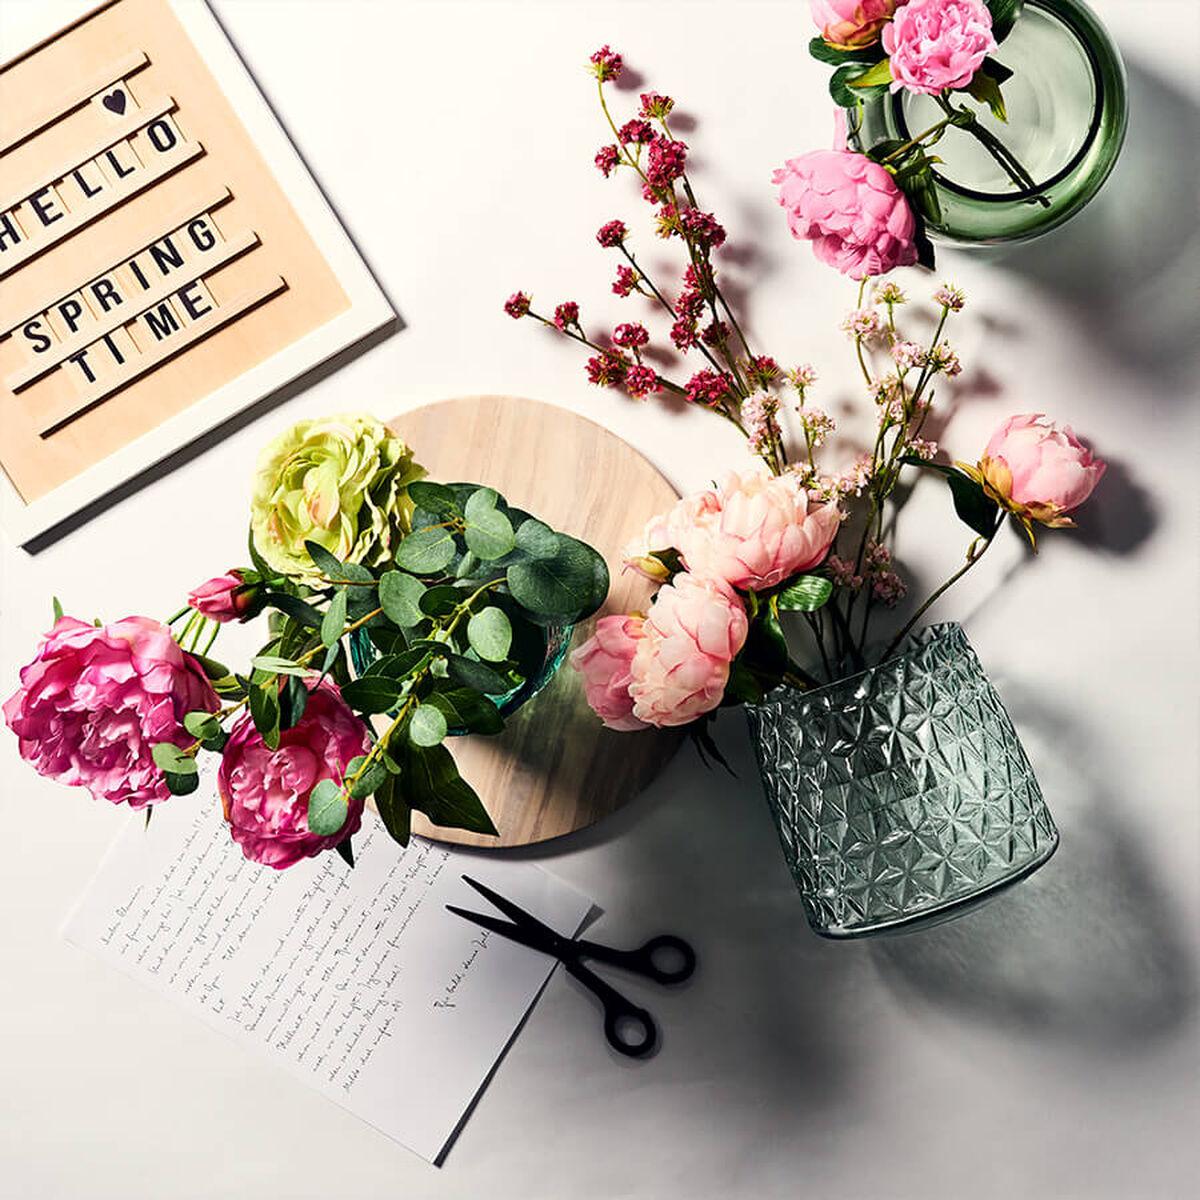 kunstblumen kunstpflanzen online kaufen butlers. Black Bedroom Furniture Sets. Home Design Ideas